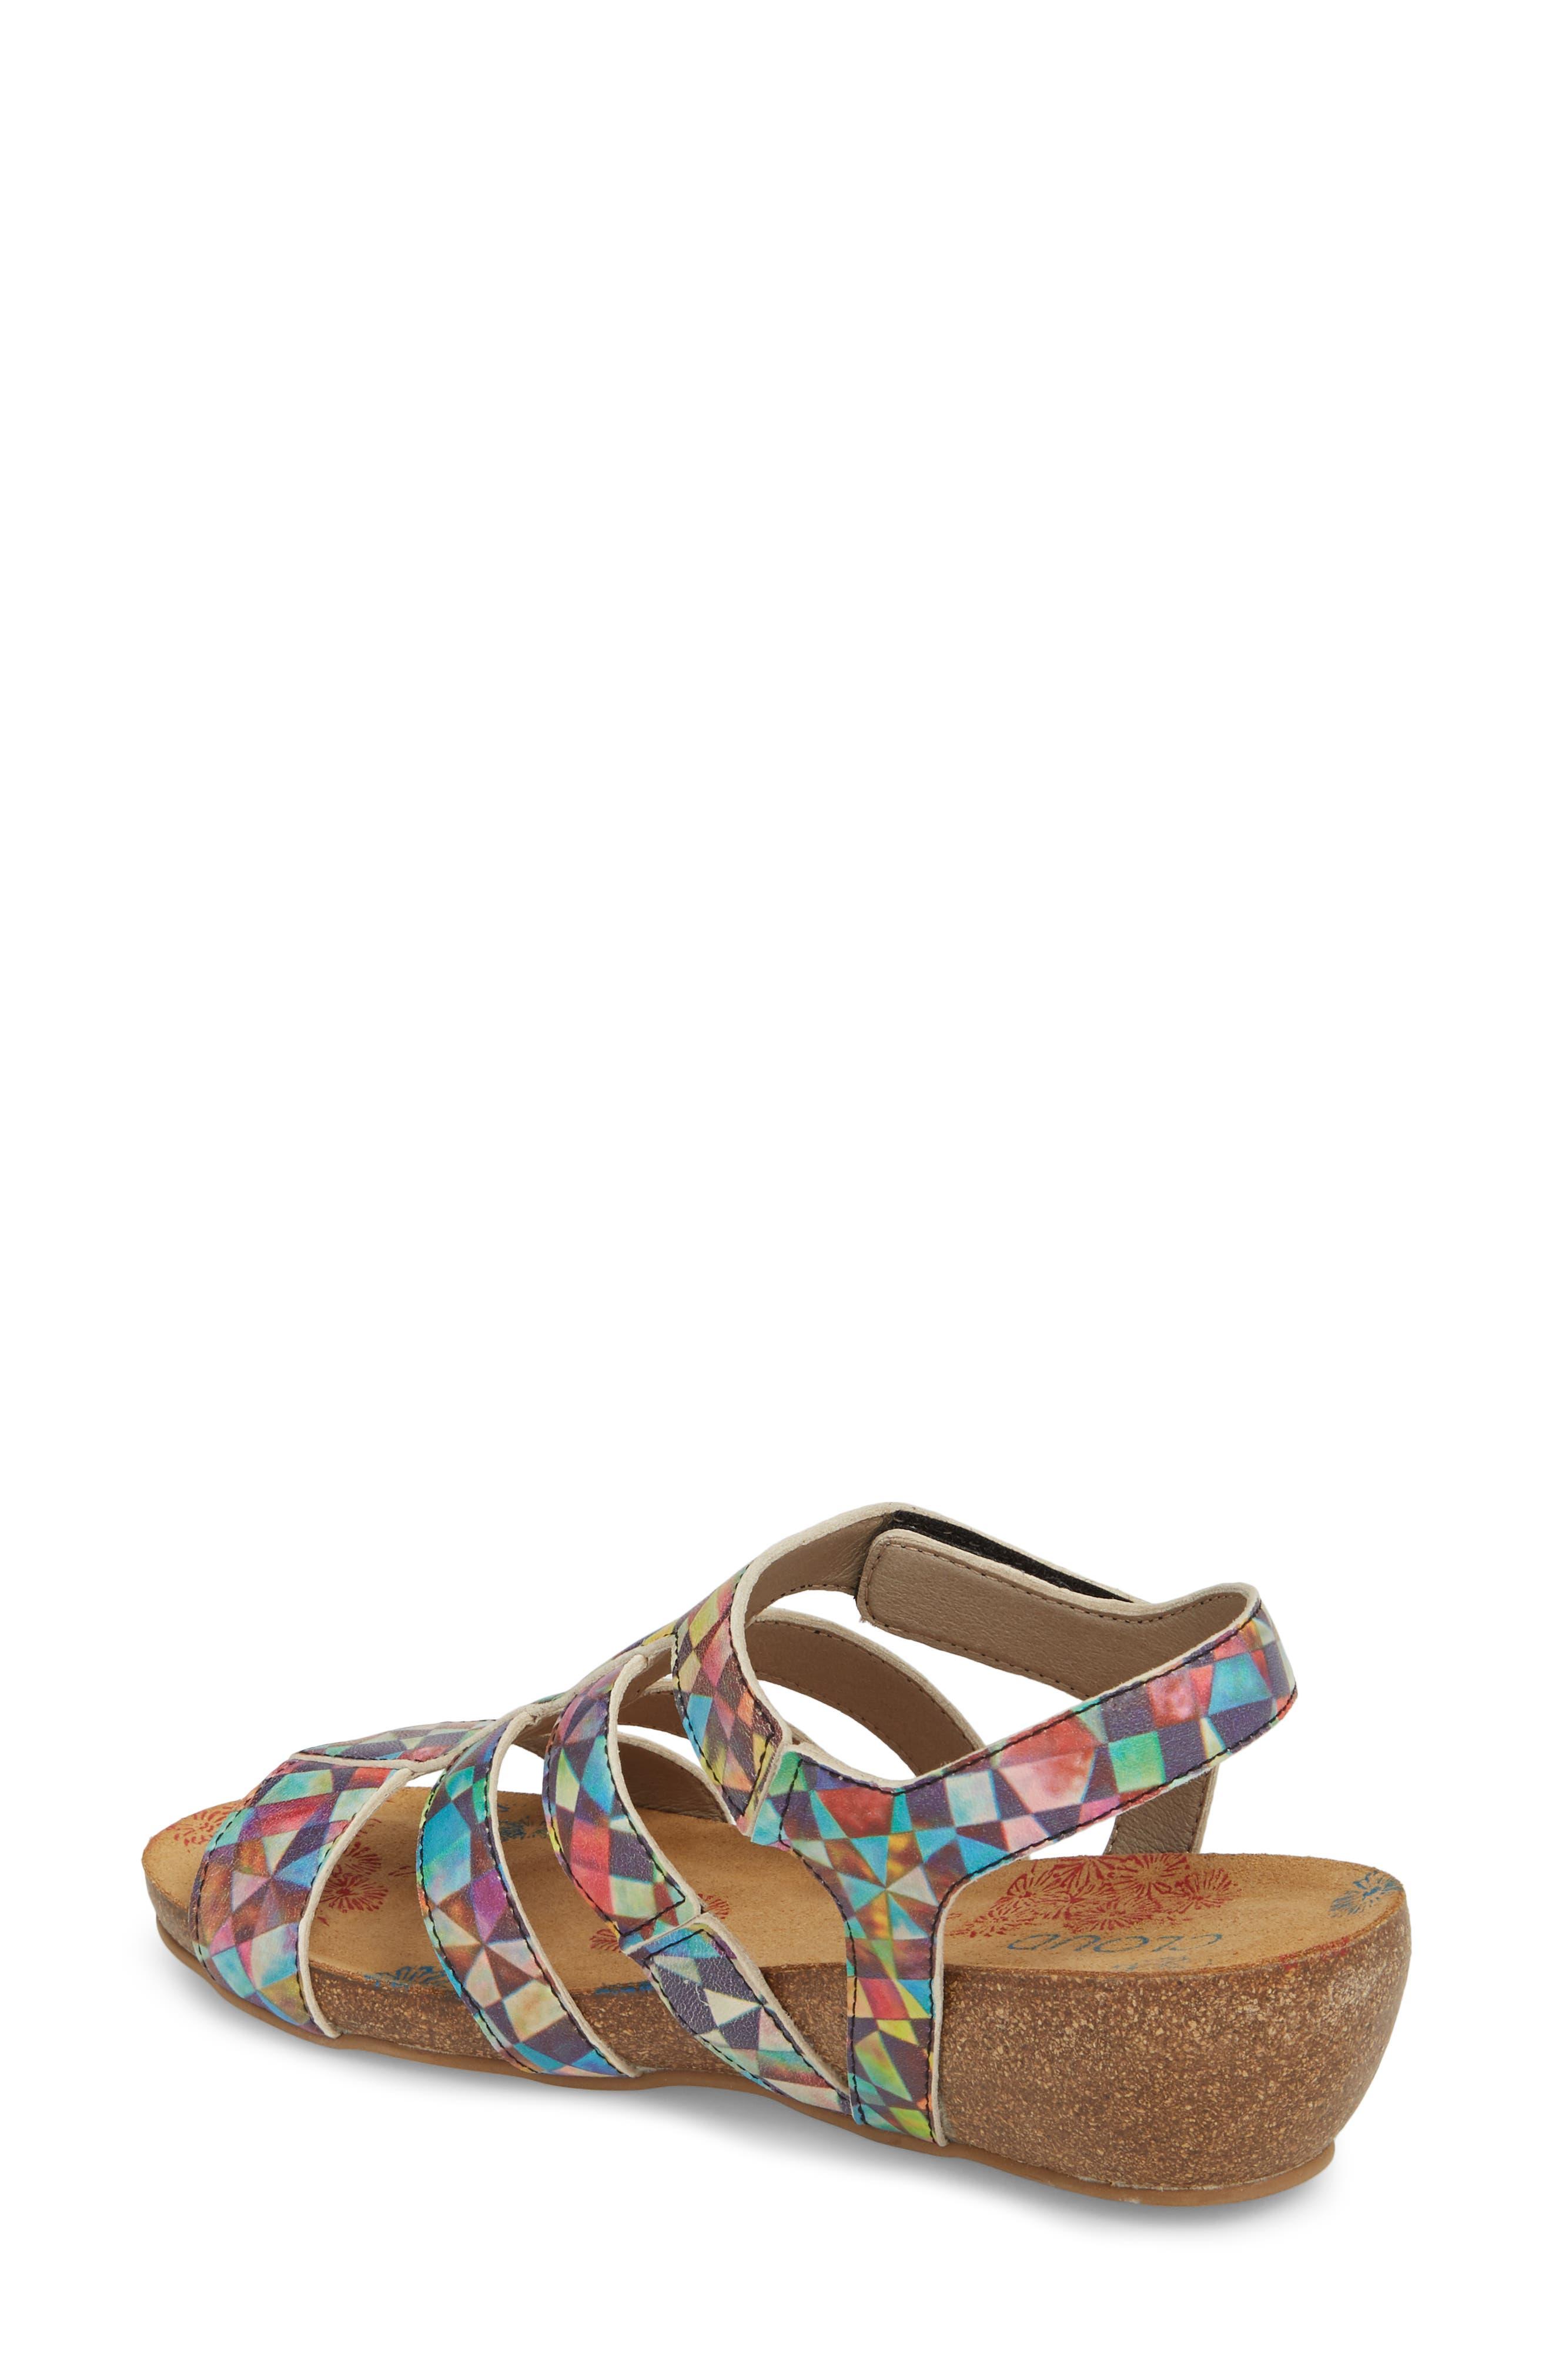 Delta Wedge Sandal,                             Alternate thumbnail 2, color,                             500